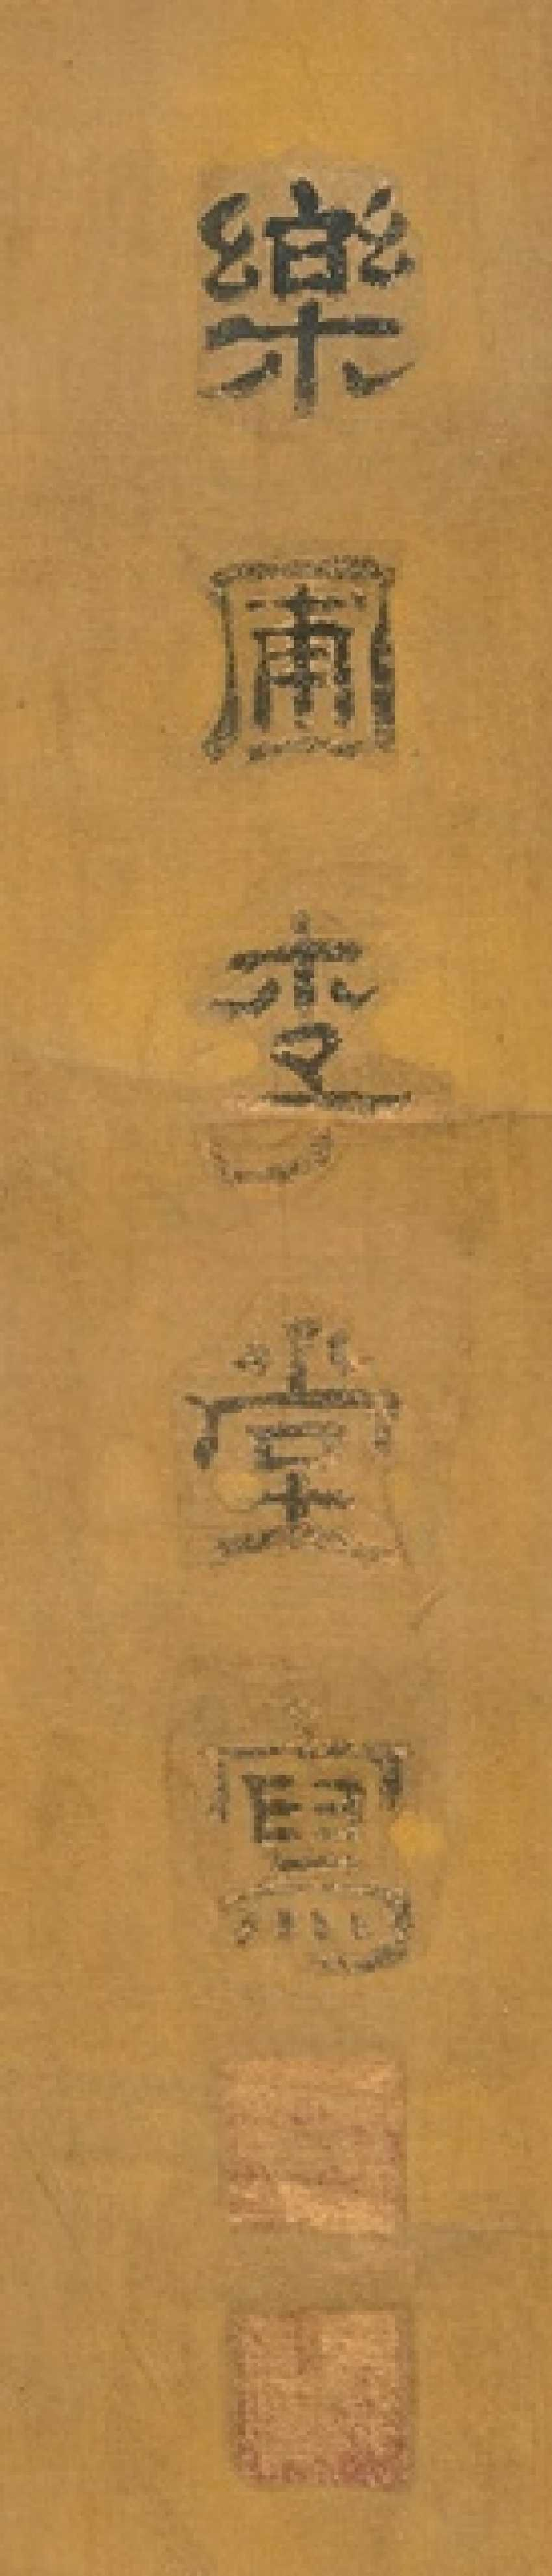 Fine representation of the deity tianguan (ruler of heaven) m it boys - photo 2